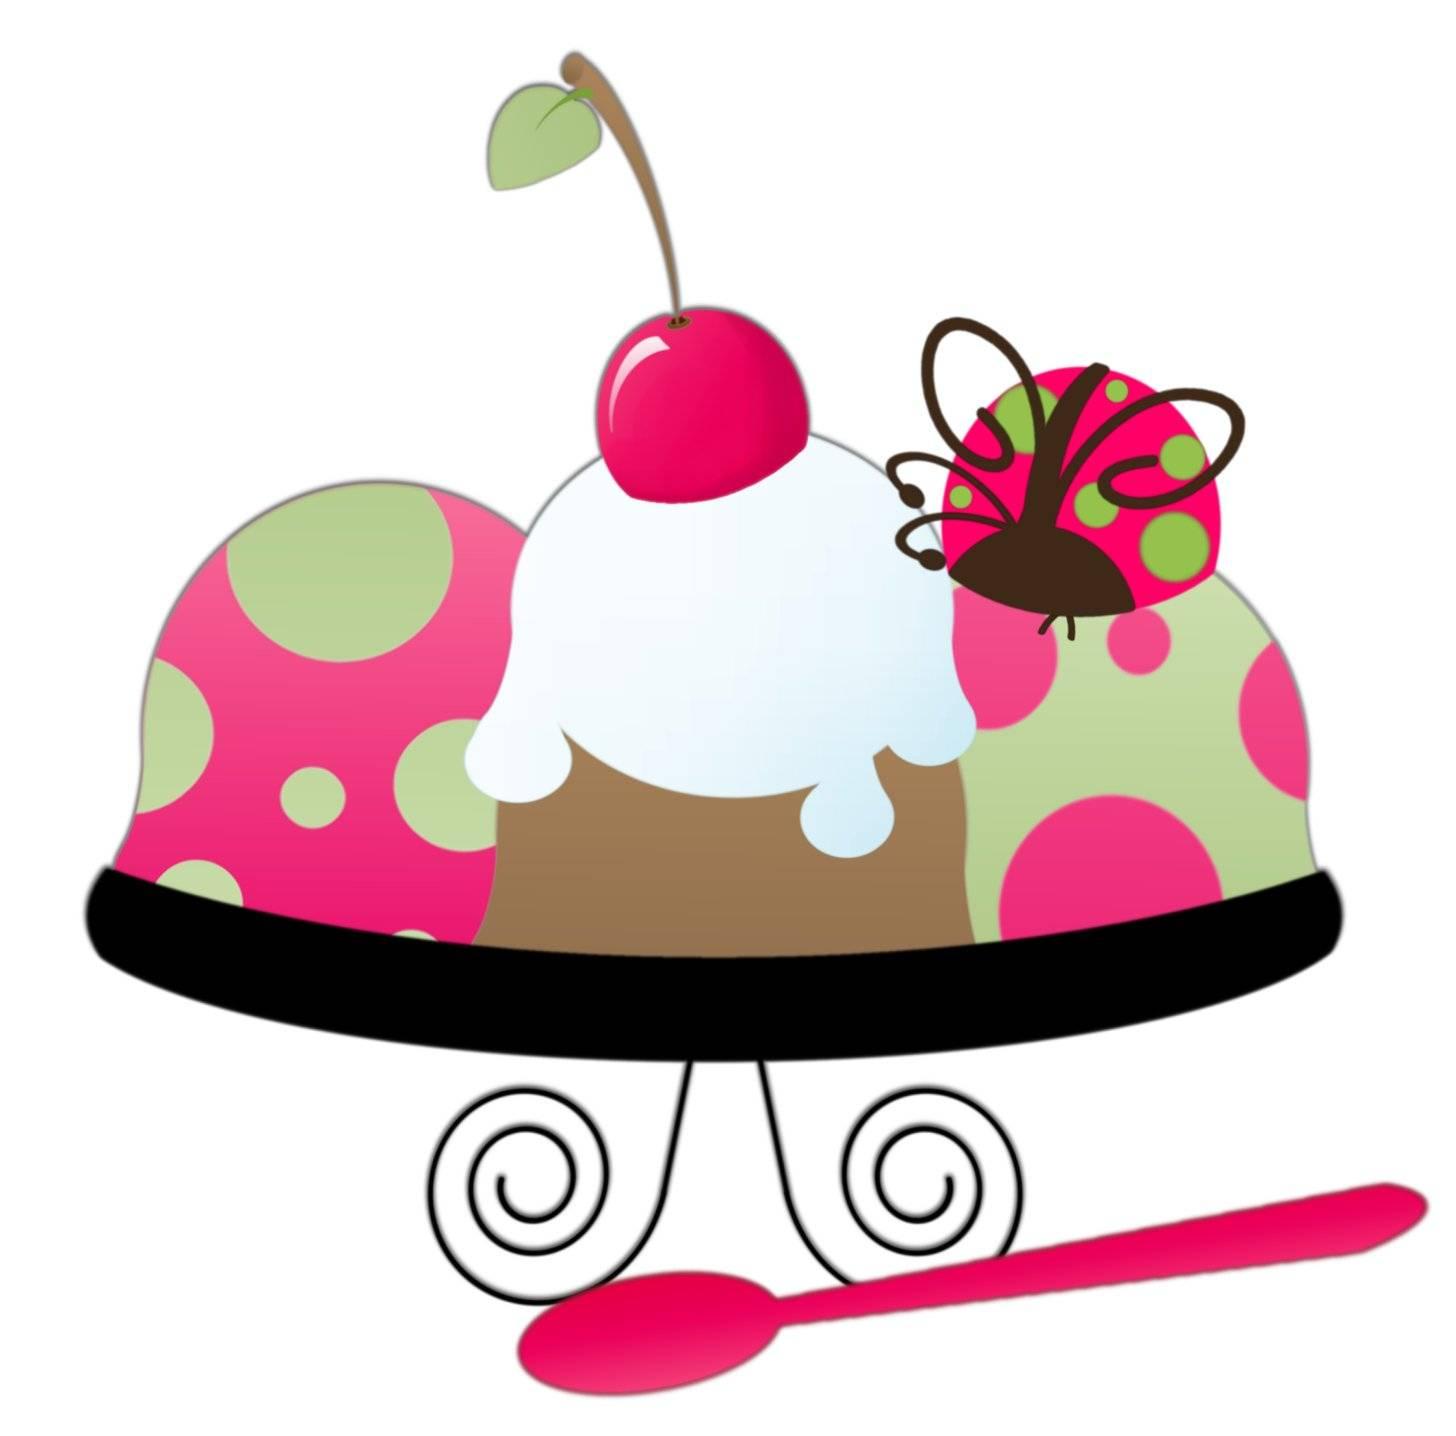 cartoon ice cream sundae cliparts co ice cream sundae clipart black and white ice cream sundae clip art for